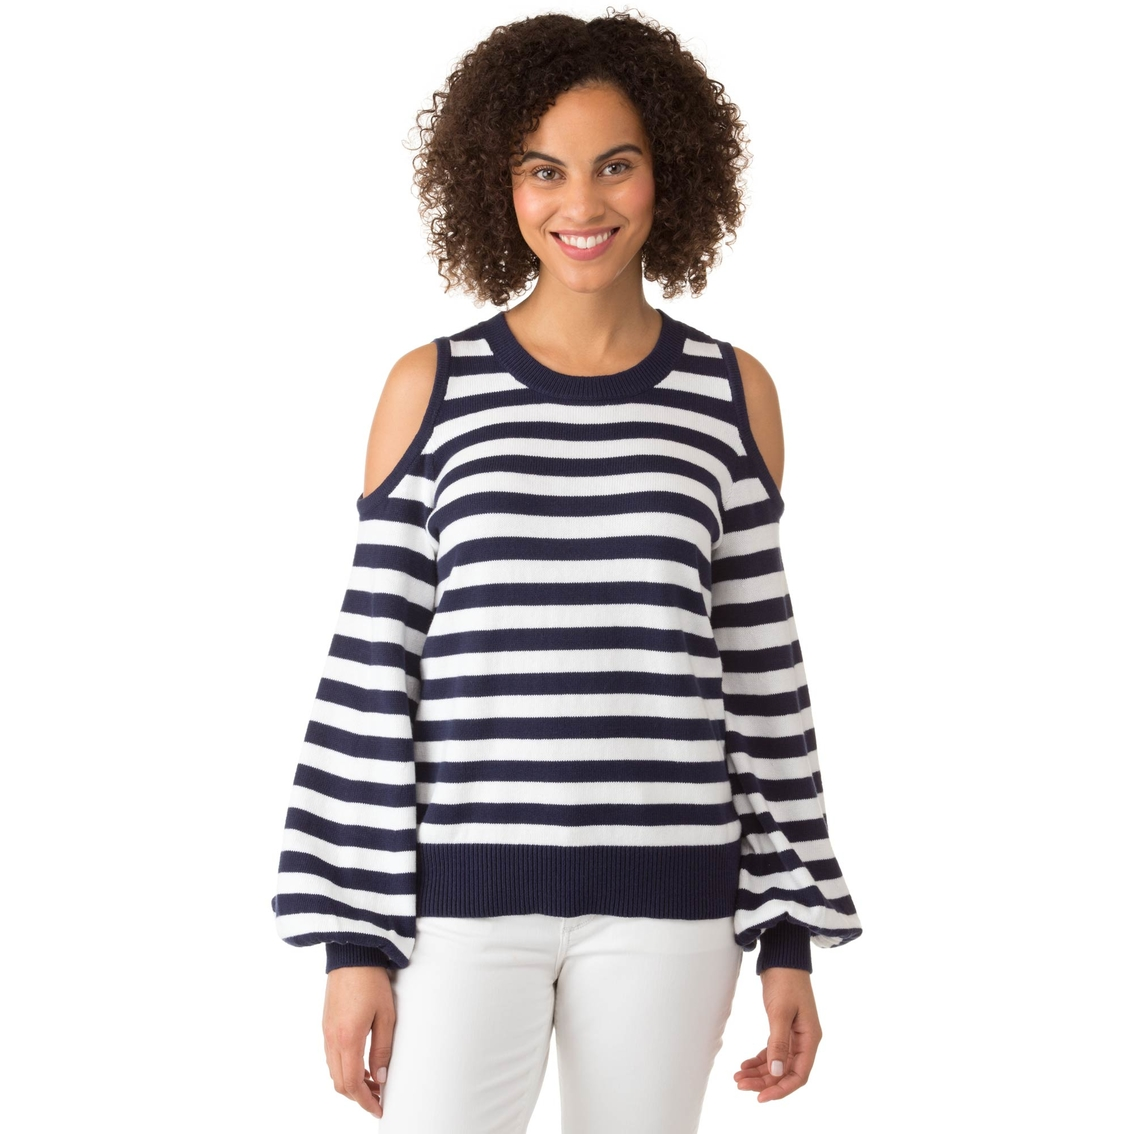 637bc6a548e04 Michael Kors Petite Stripe Cold Shoulder Sweater